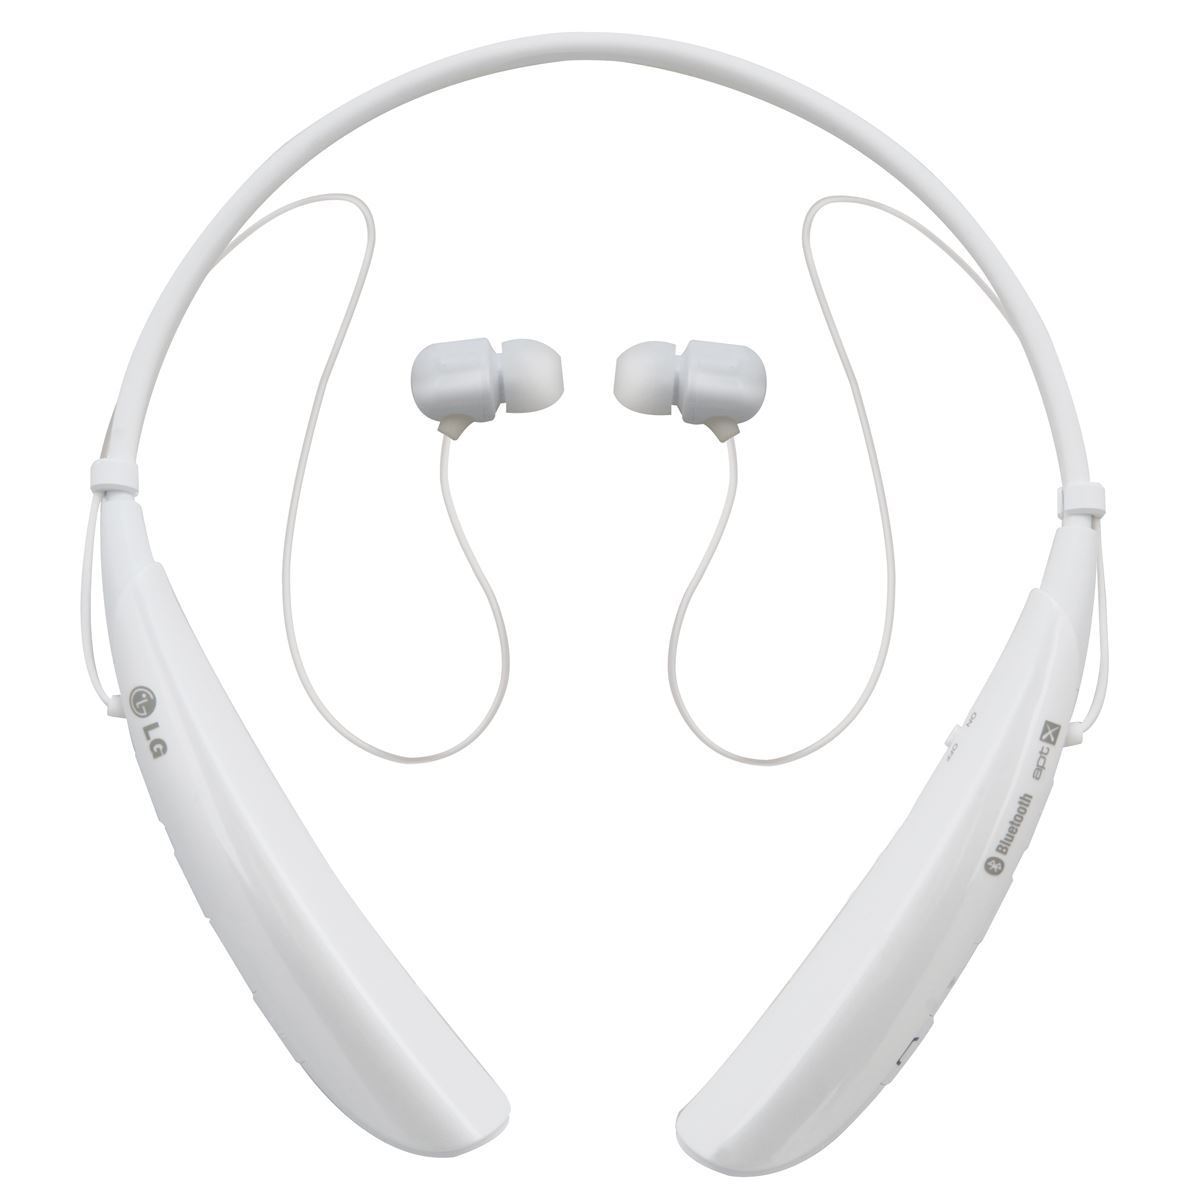 Audífonos LG HBS-750 Blancos